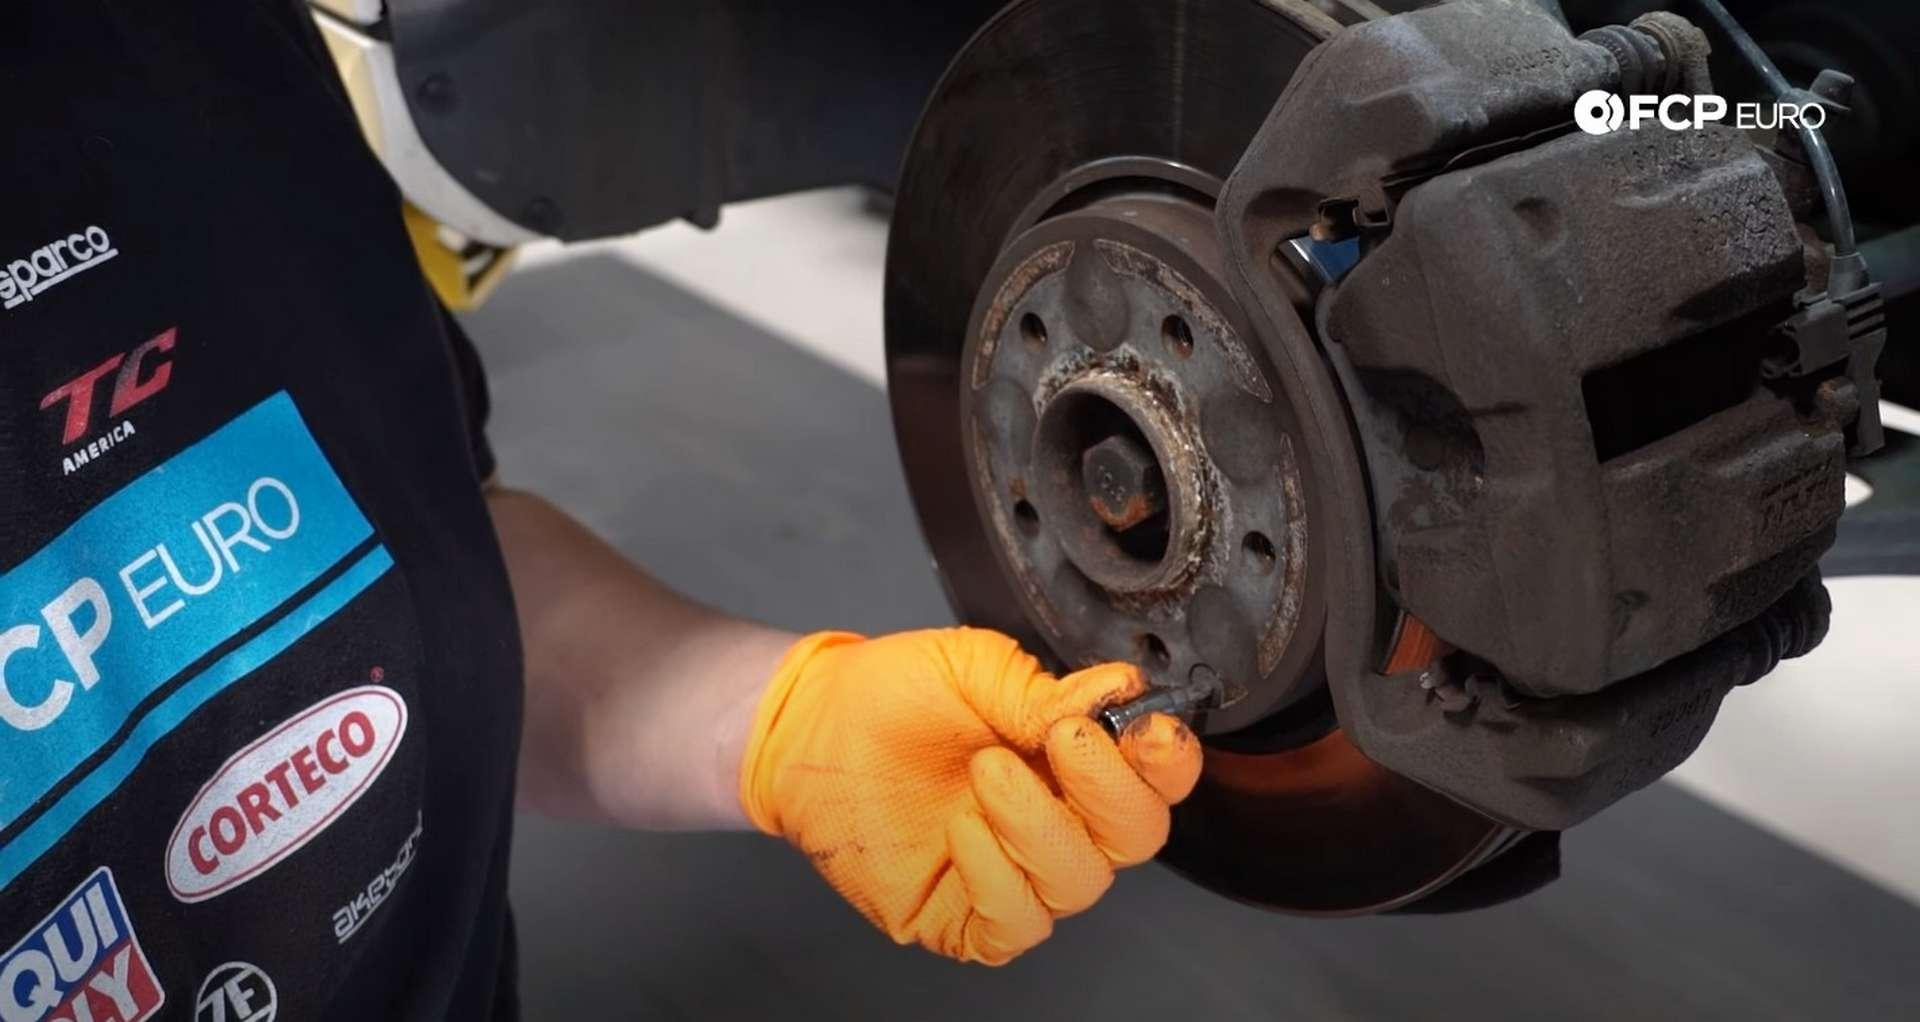 DIY Mercedes W203 Front Brake Service removing the set screw